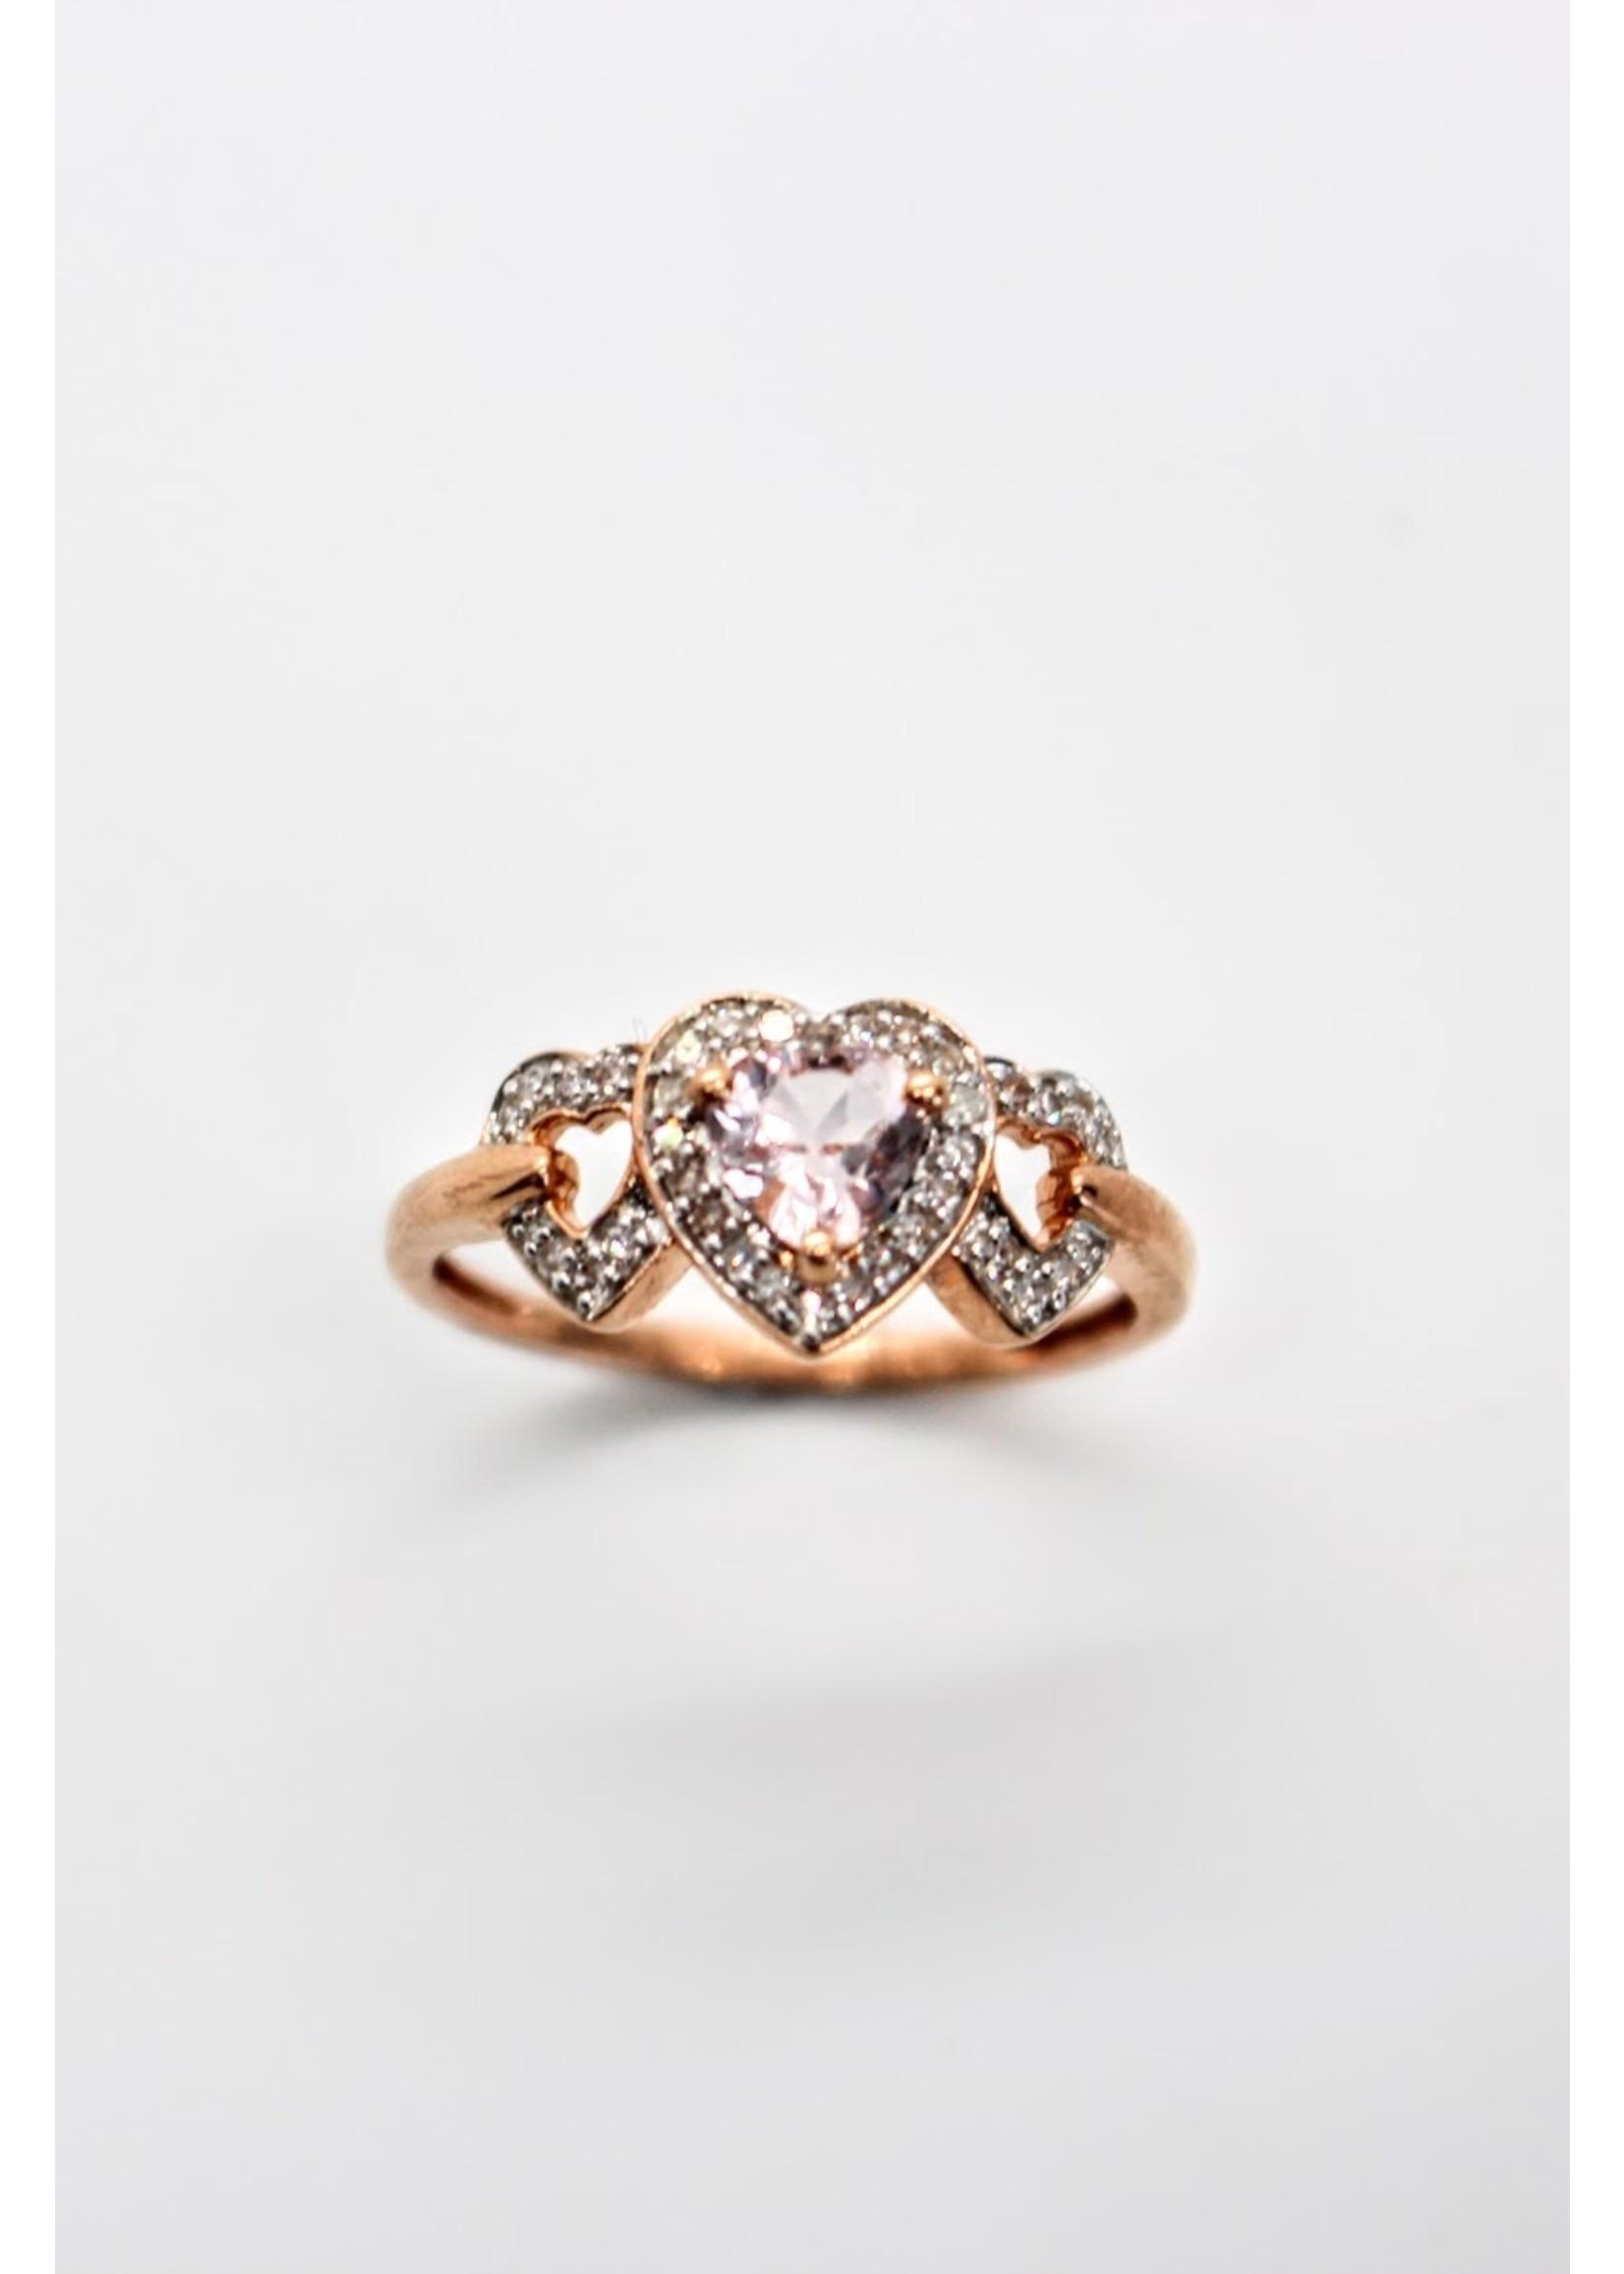 Bague 3 cœurs Or rose 10K avec morganite et diamants